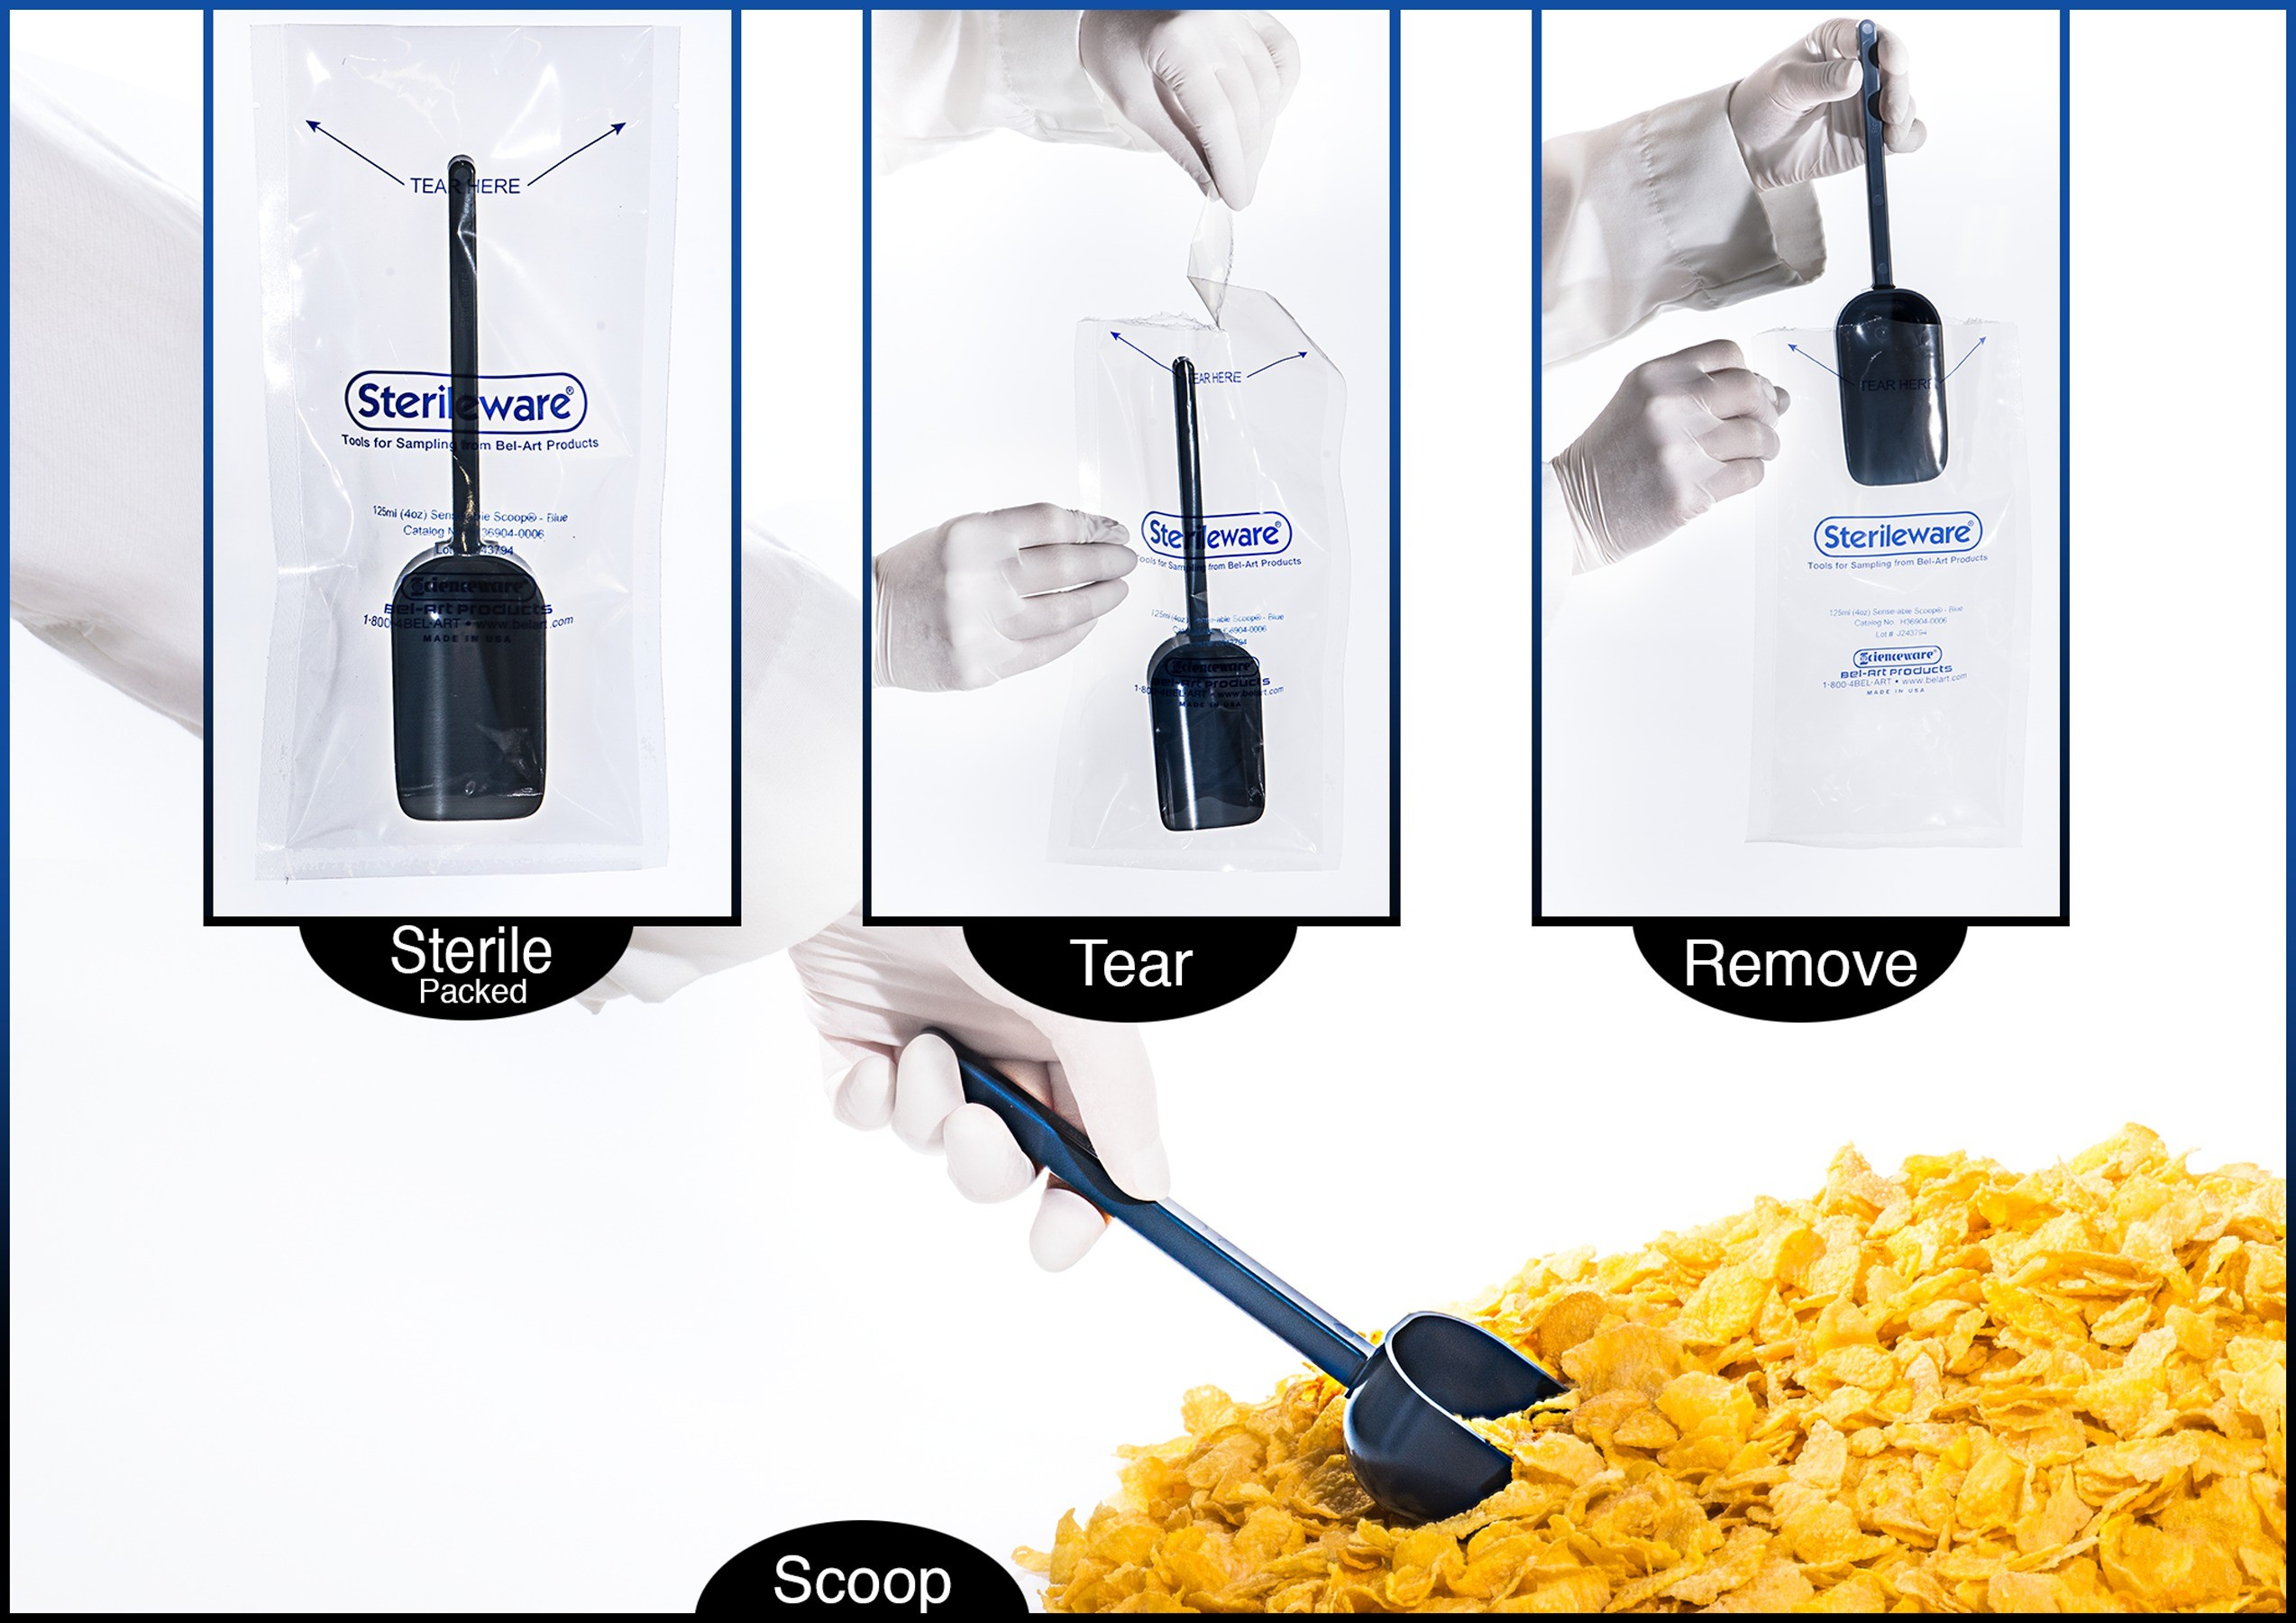 Sterileware Sense-able Scoops Metal Detectable, Sterile Sampling Tools